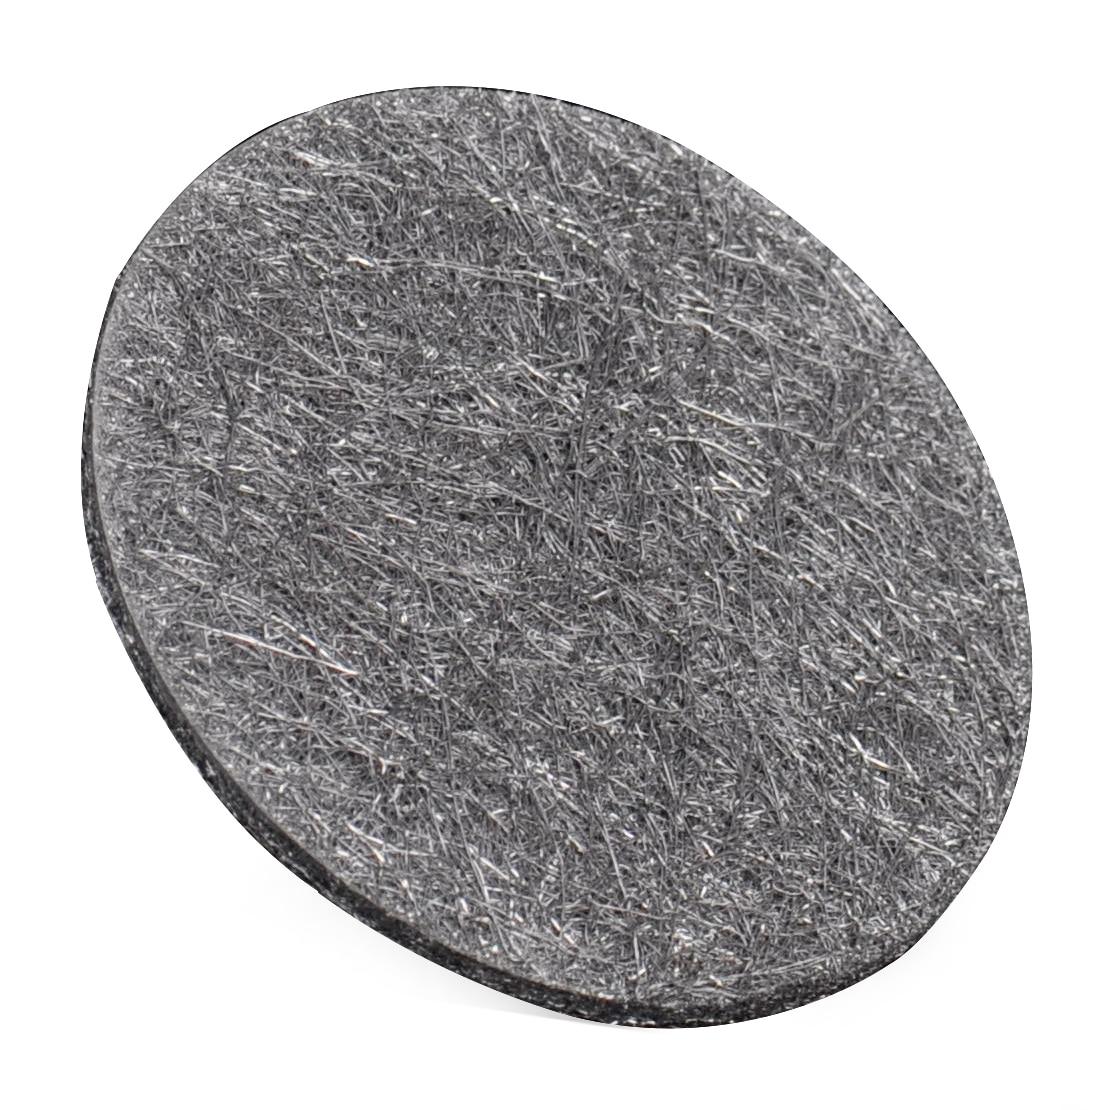 DWCX Metal Silver Heater Burner Screen Pad Replacement Part Fit for Webasto Thermo Top E/C/V EVO 4/5 4cm x0.35cm (1.57x0.13inch)